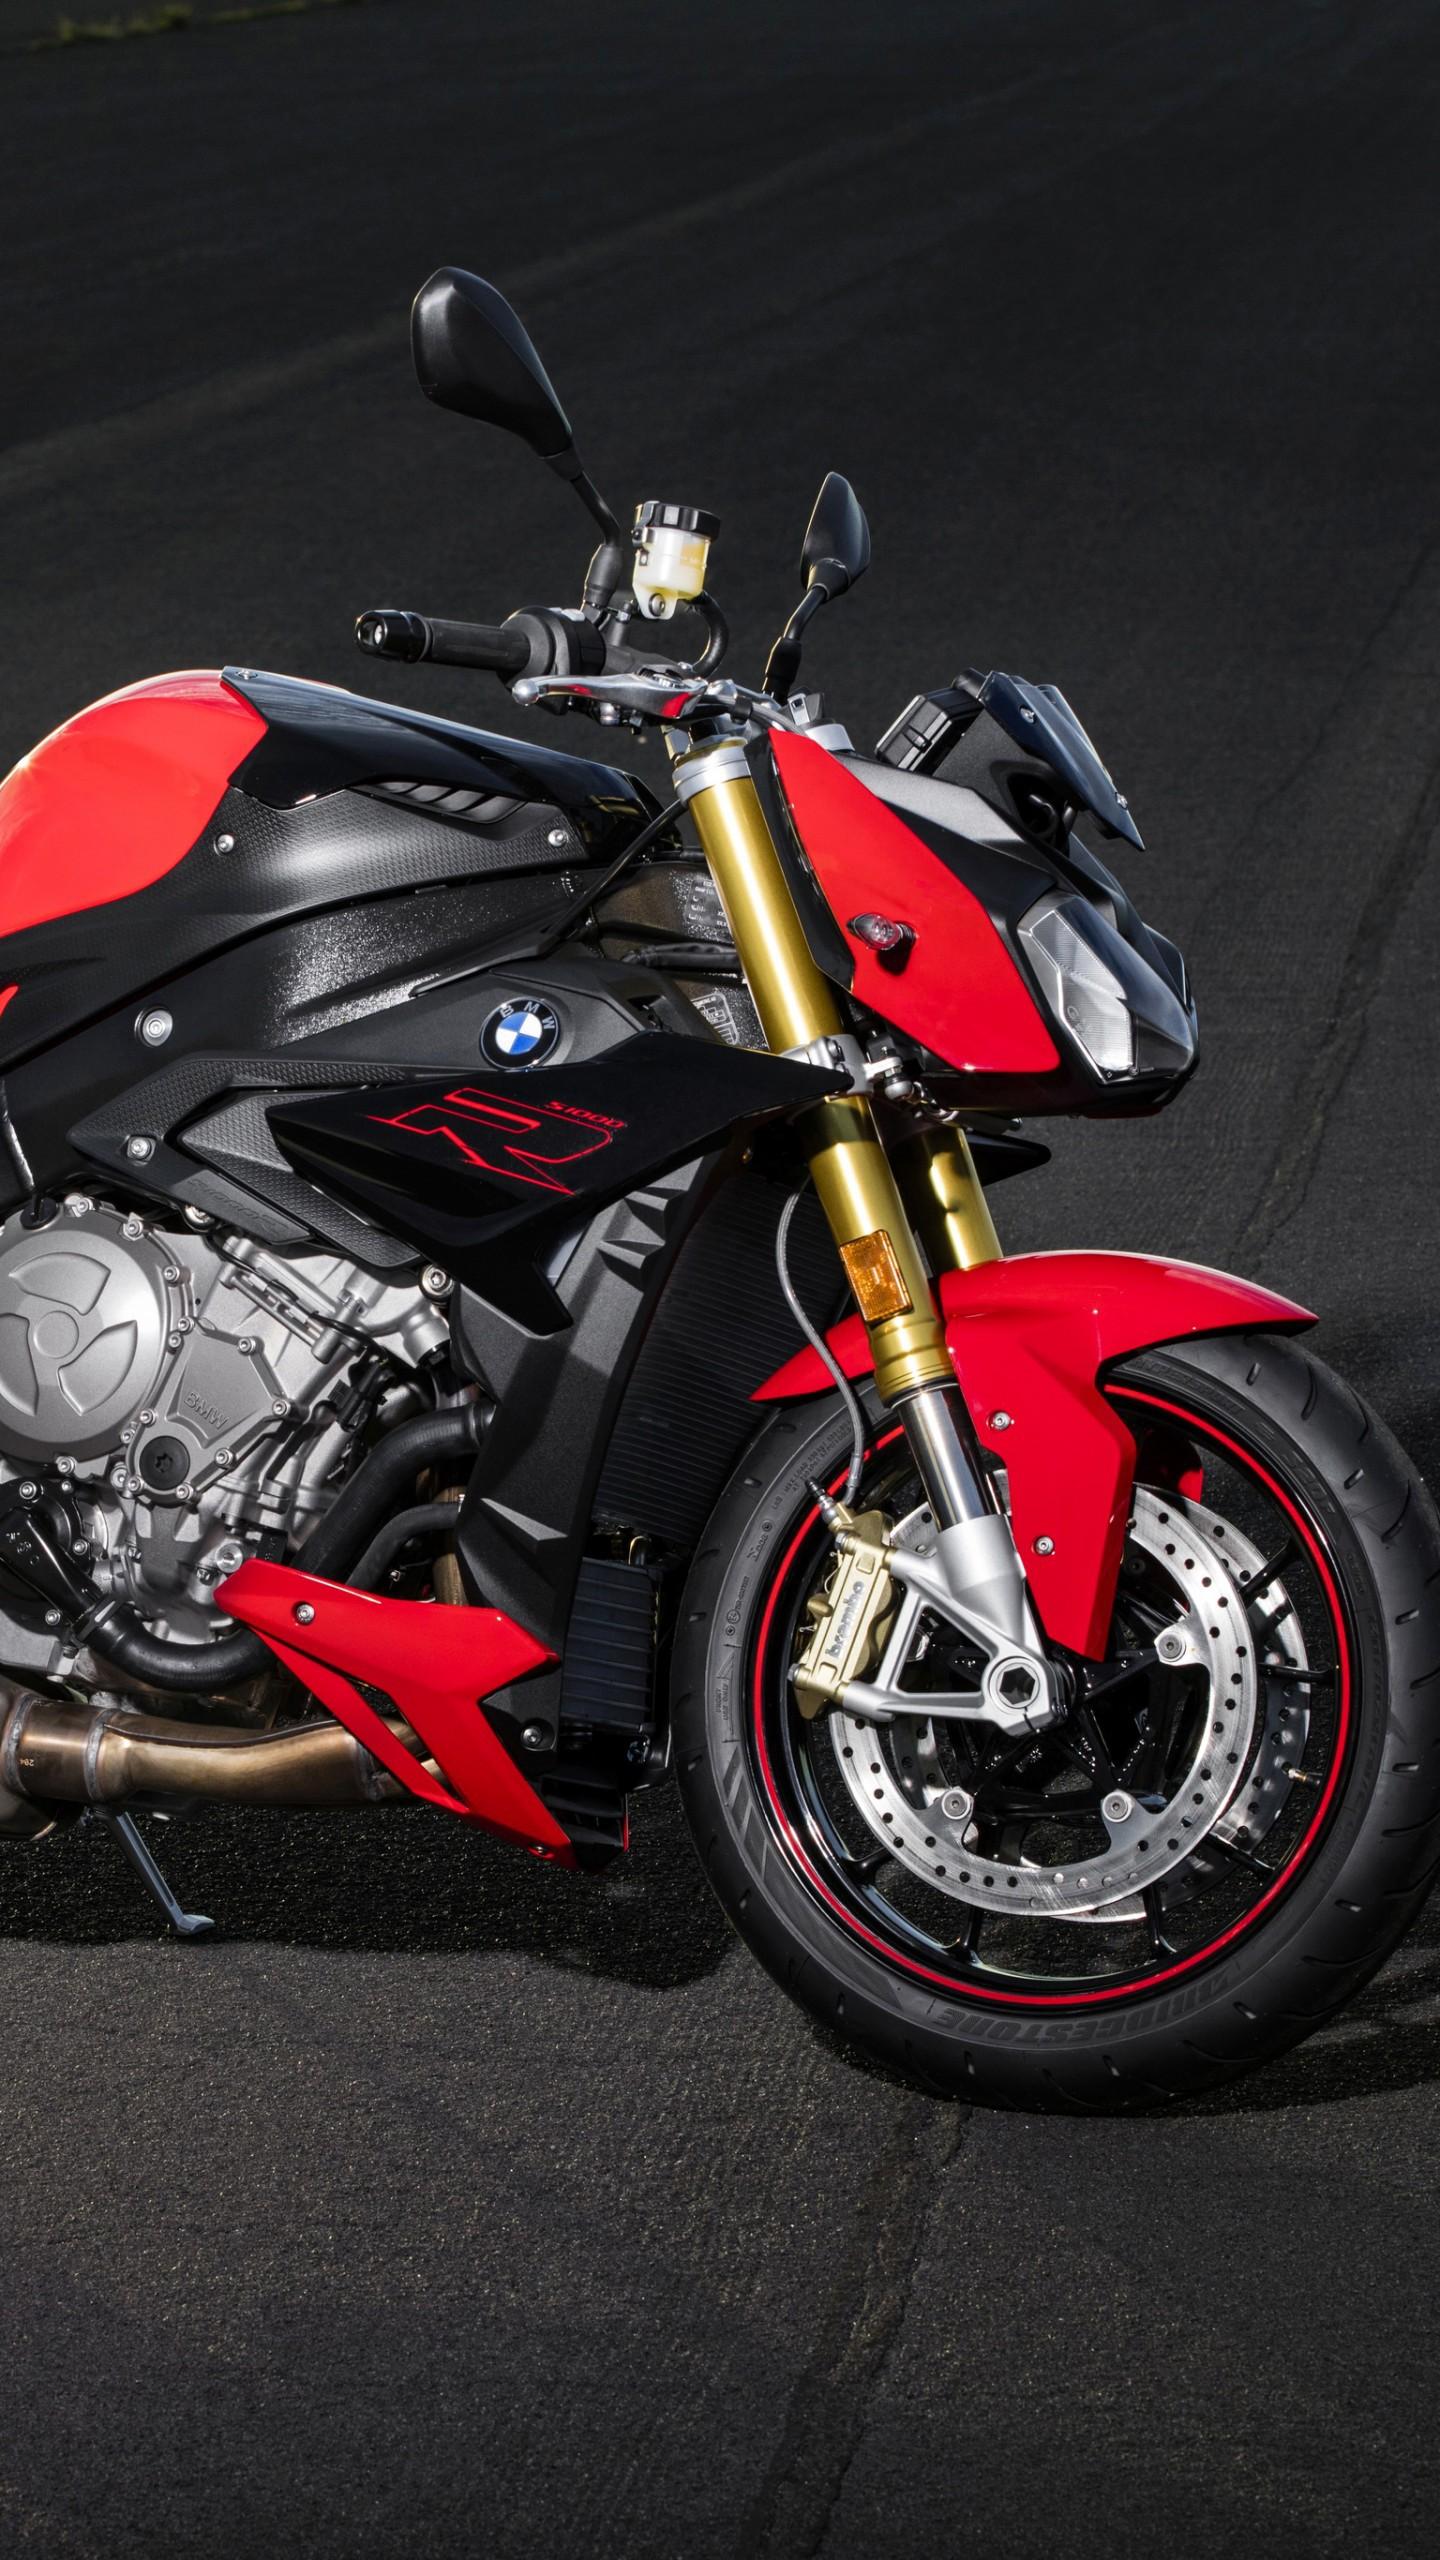 عکس زمینه موتور بی ام دبلیو قرمز رنگ BMW S1000 پس زمینه